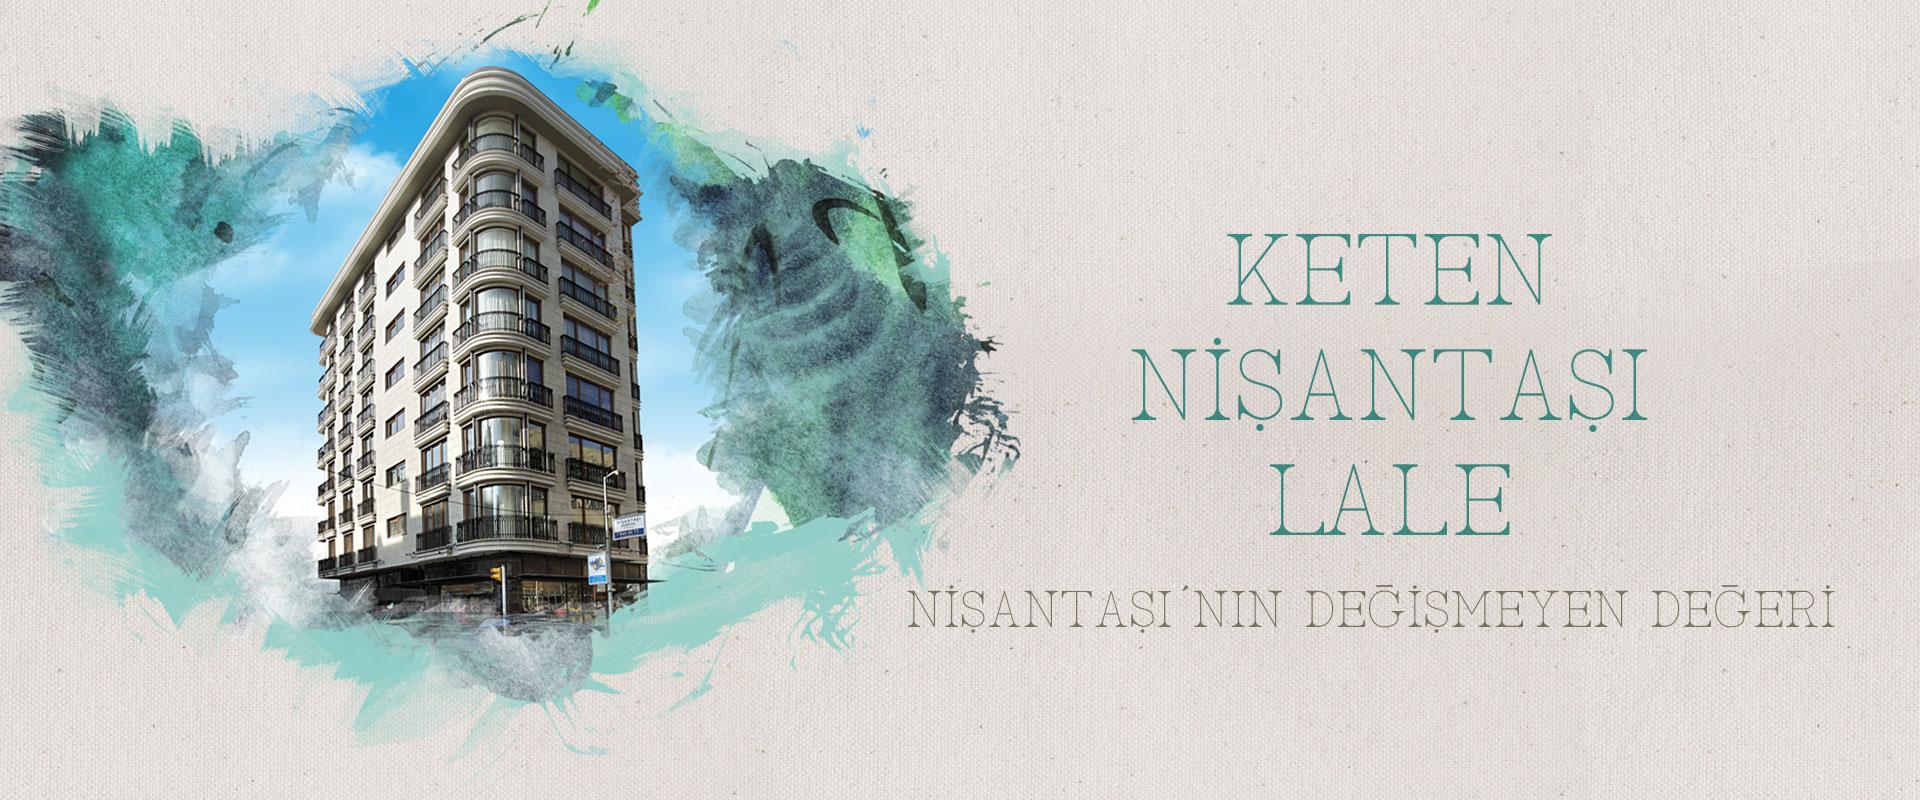 ket443_nisantasi_lale